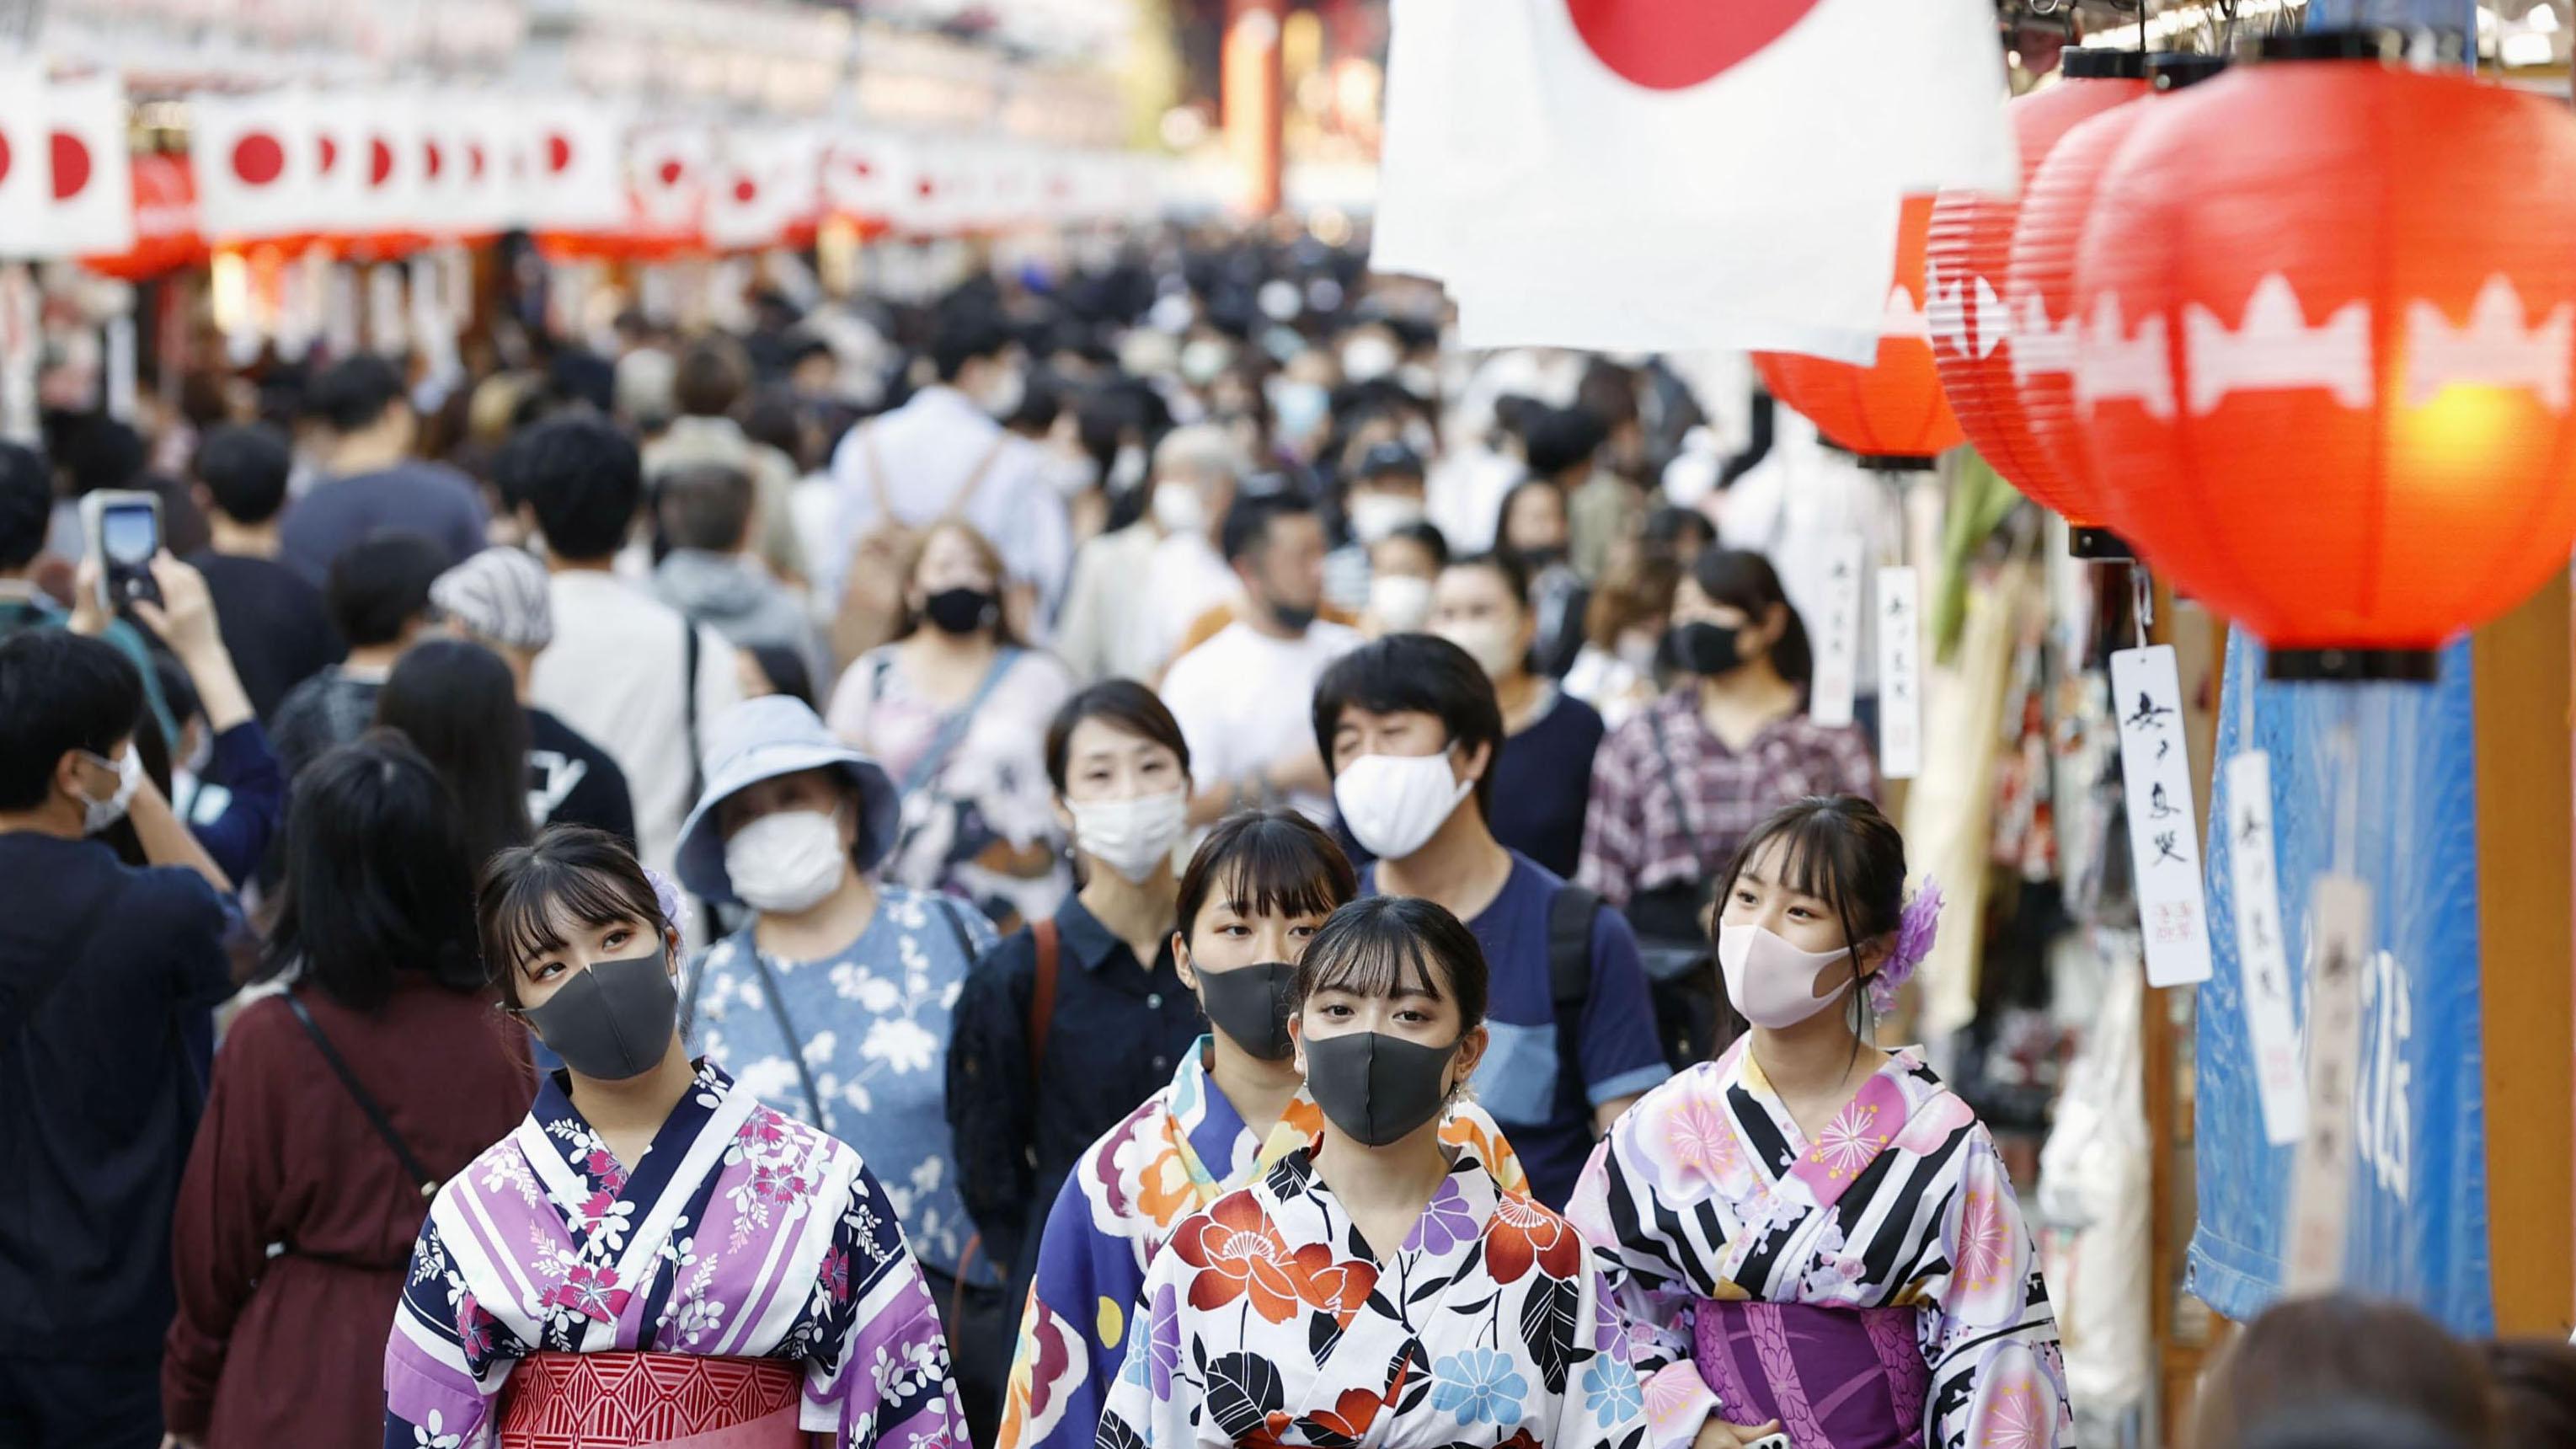 nikkei.com - ERI SUGIURA - Tokyo residents become eligible for $12.3b Go To Travel subsidies